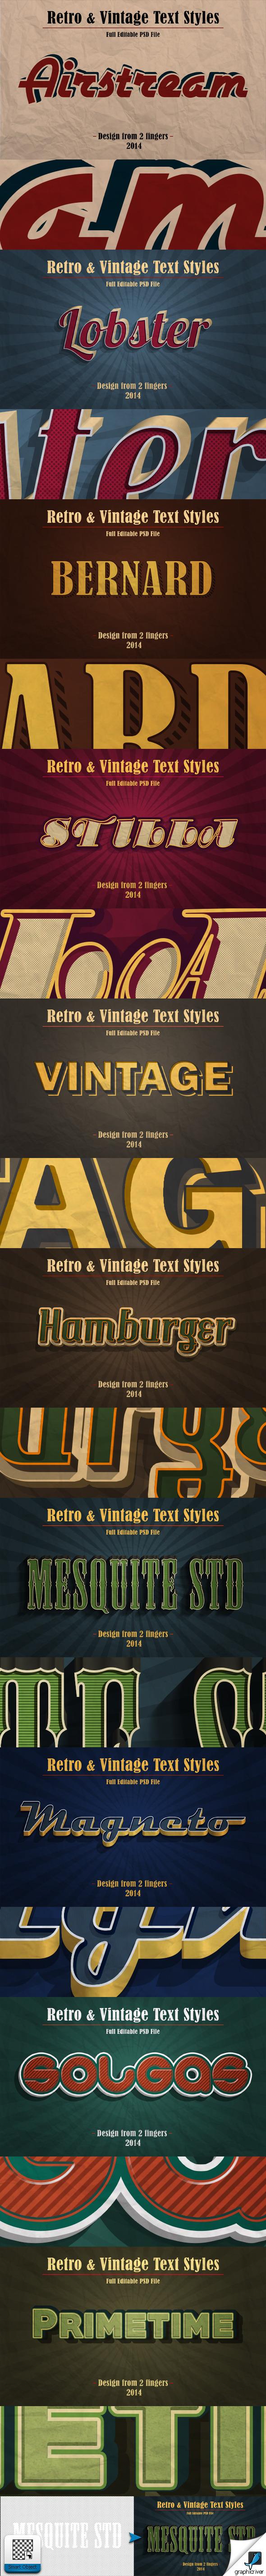 GraphicRiver Retro & Vintage Text Styles Vol.1 9524591